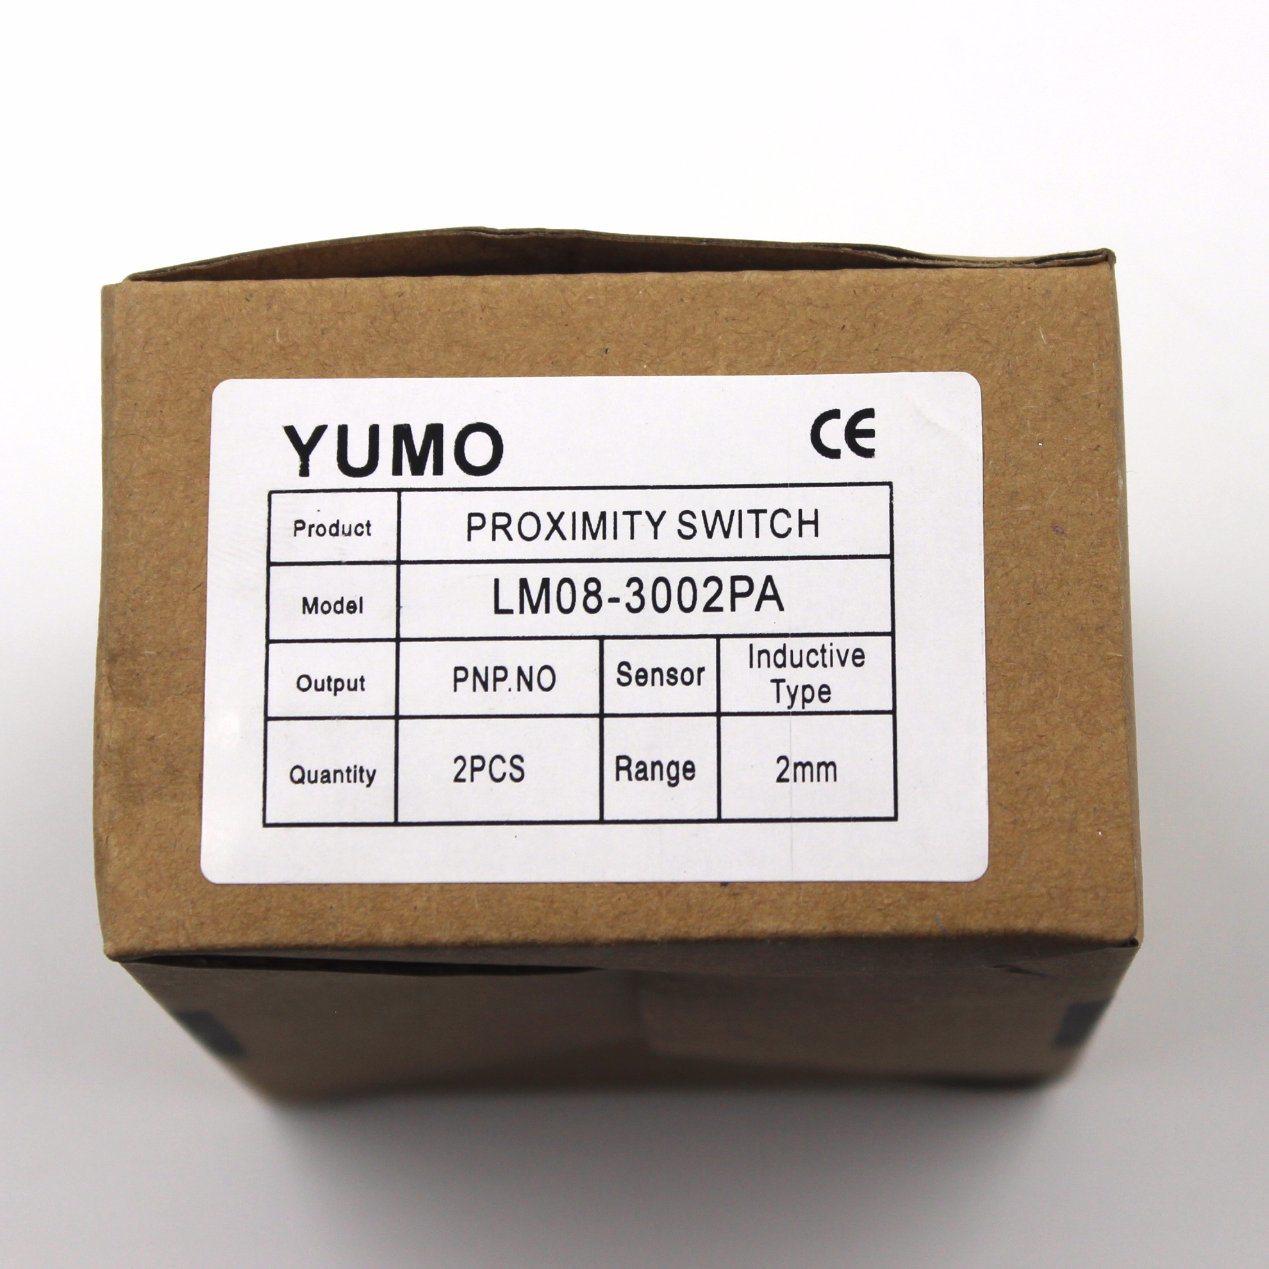 China Yumo Lm08 3002pa Proximity Switch Optical Inductive Npn Type Dc Pnp Sensor Capacitive